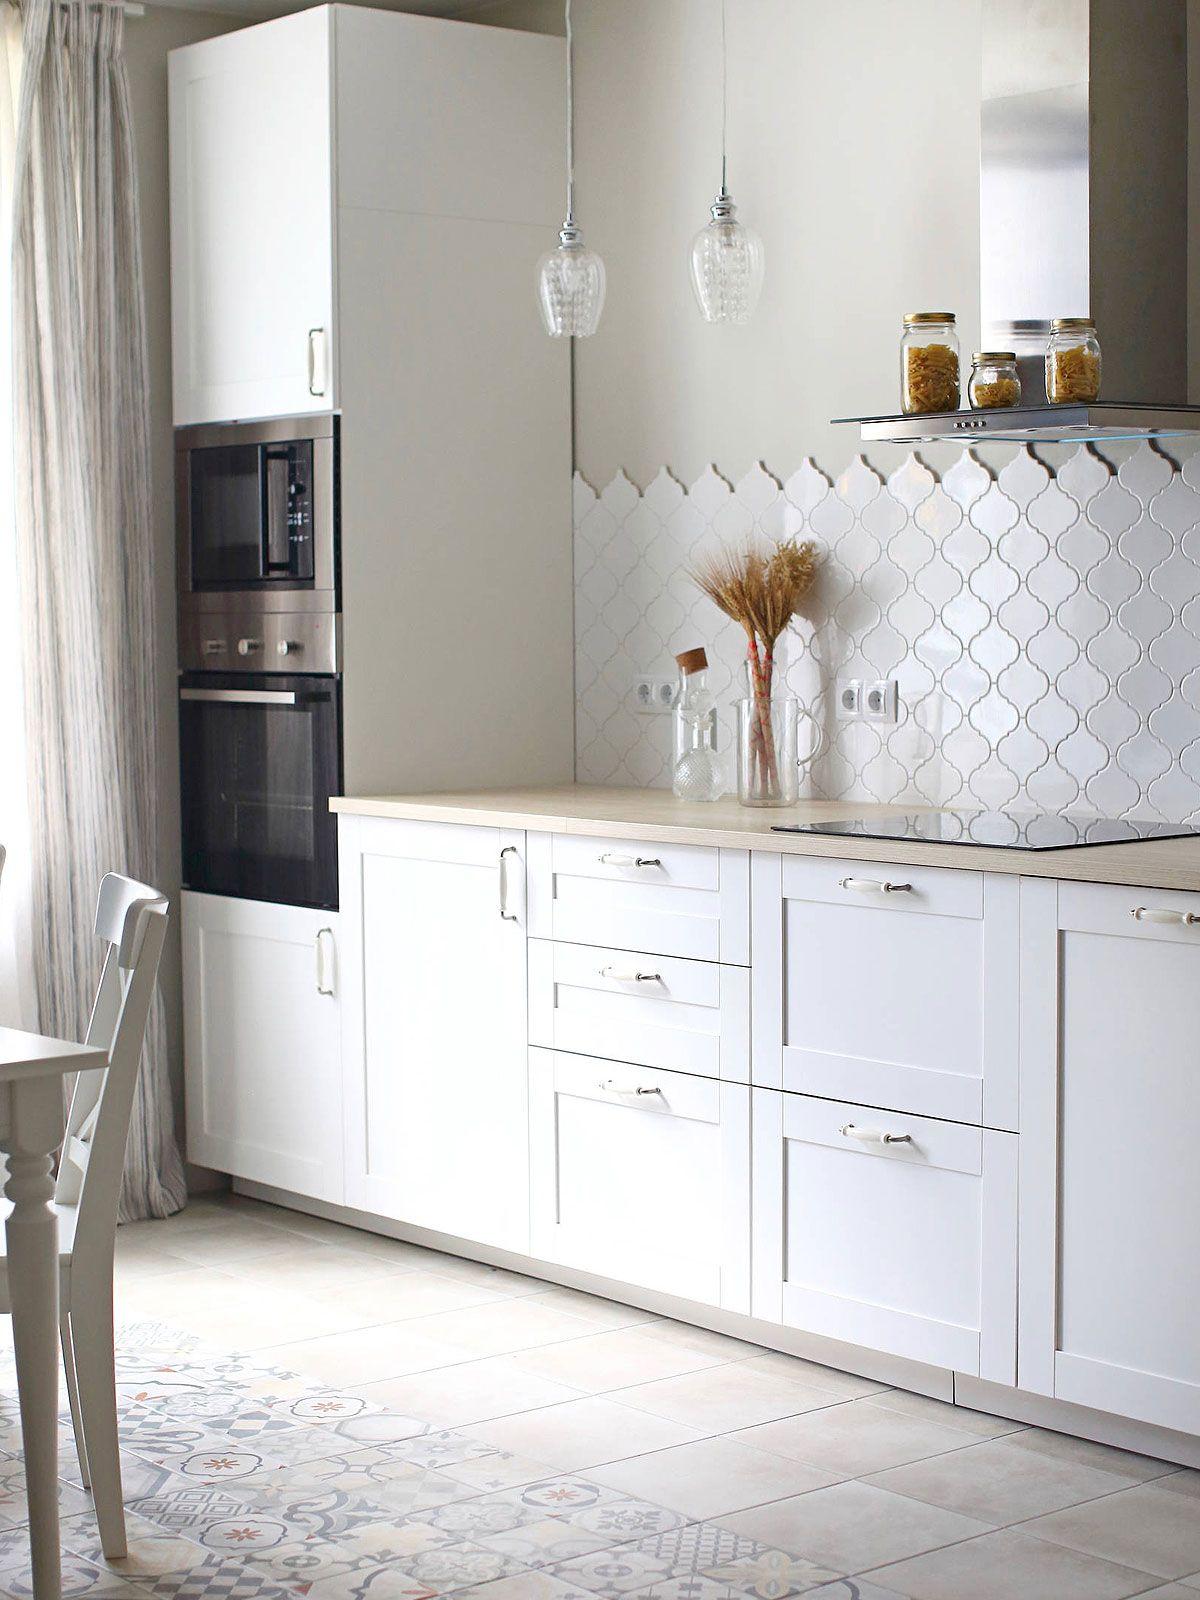 - White Glazed Porcelain Arabesque Backsplash Tile Backsplash.com